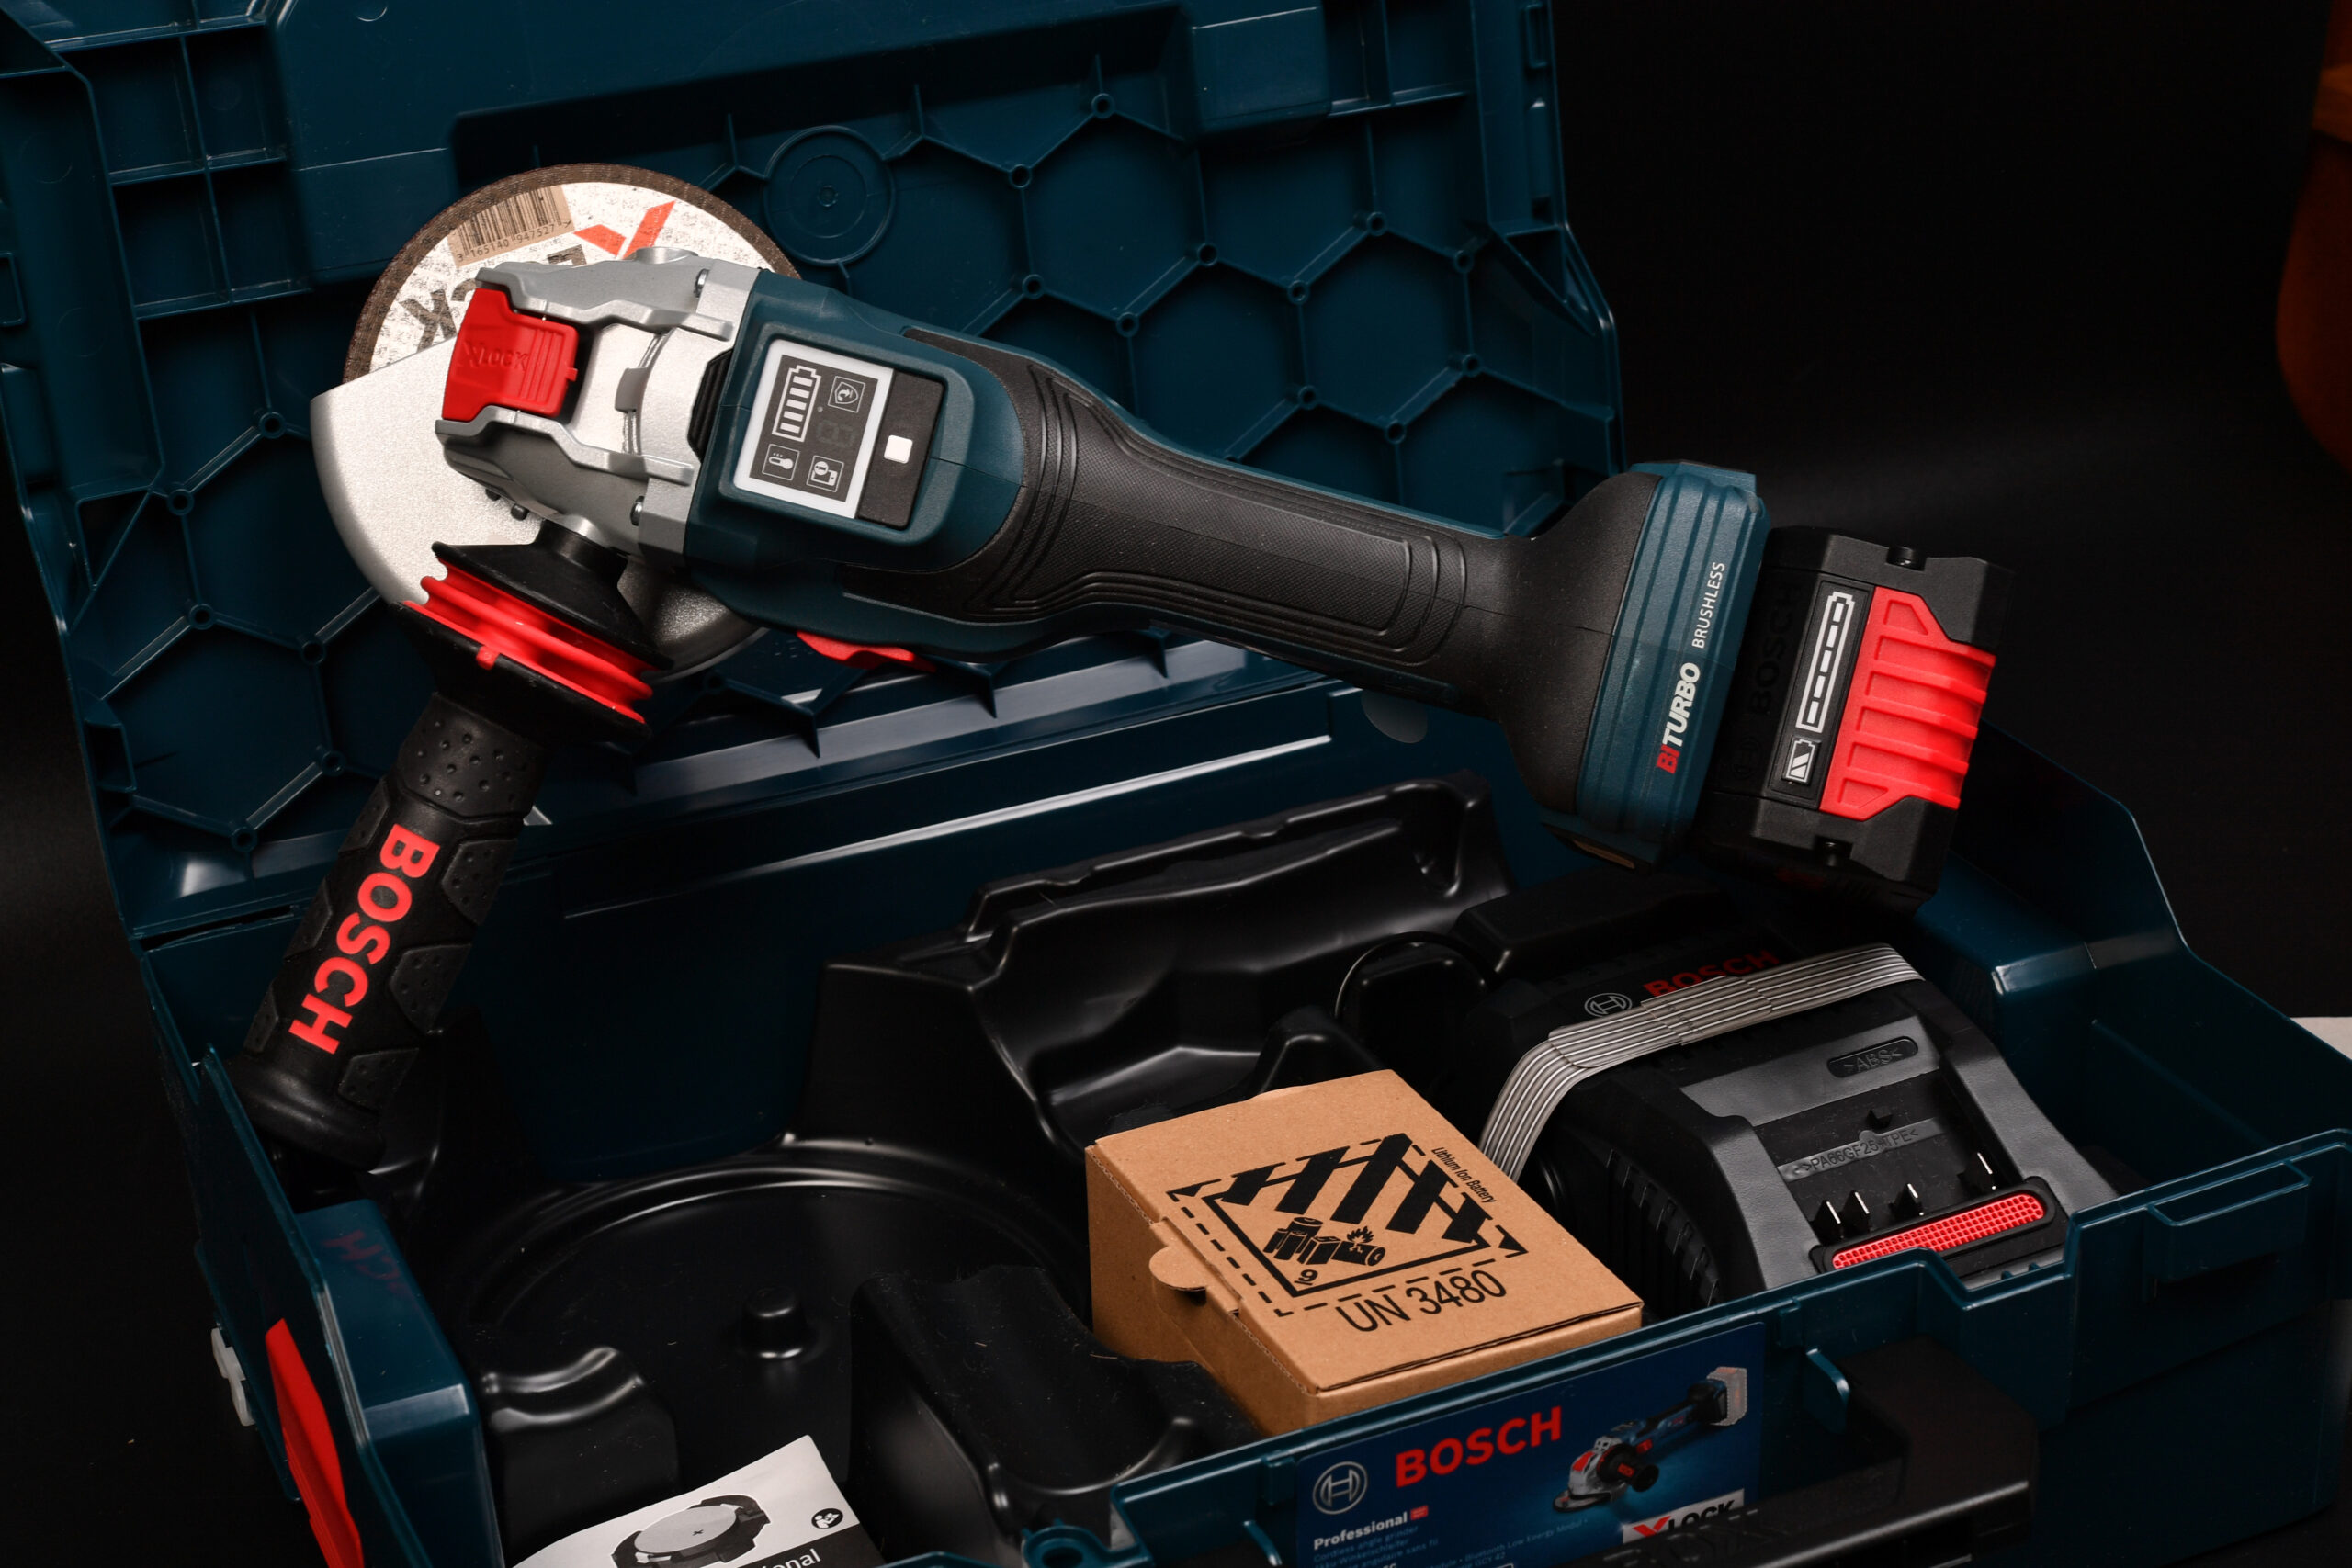 Bosch Professional(ボッシュ) 18V コードレスディスクグラインダー X-LOCK  GWX18V-15SC5J購入 レビュー